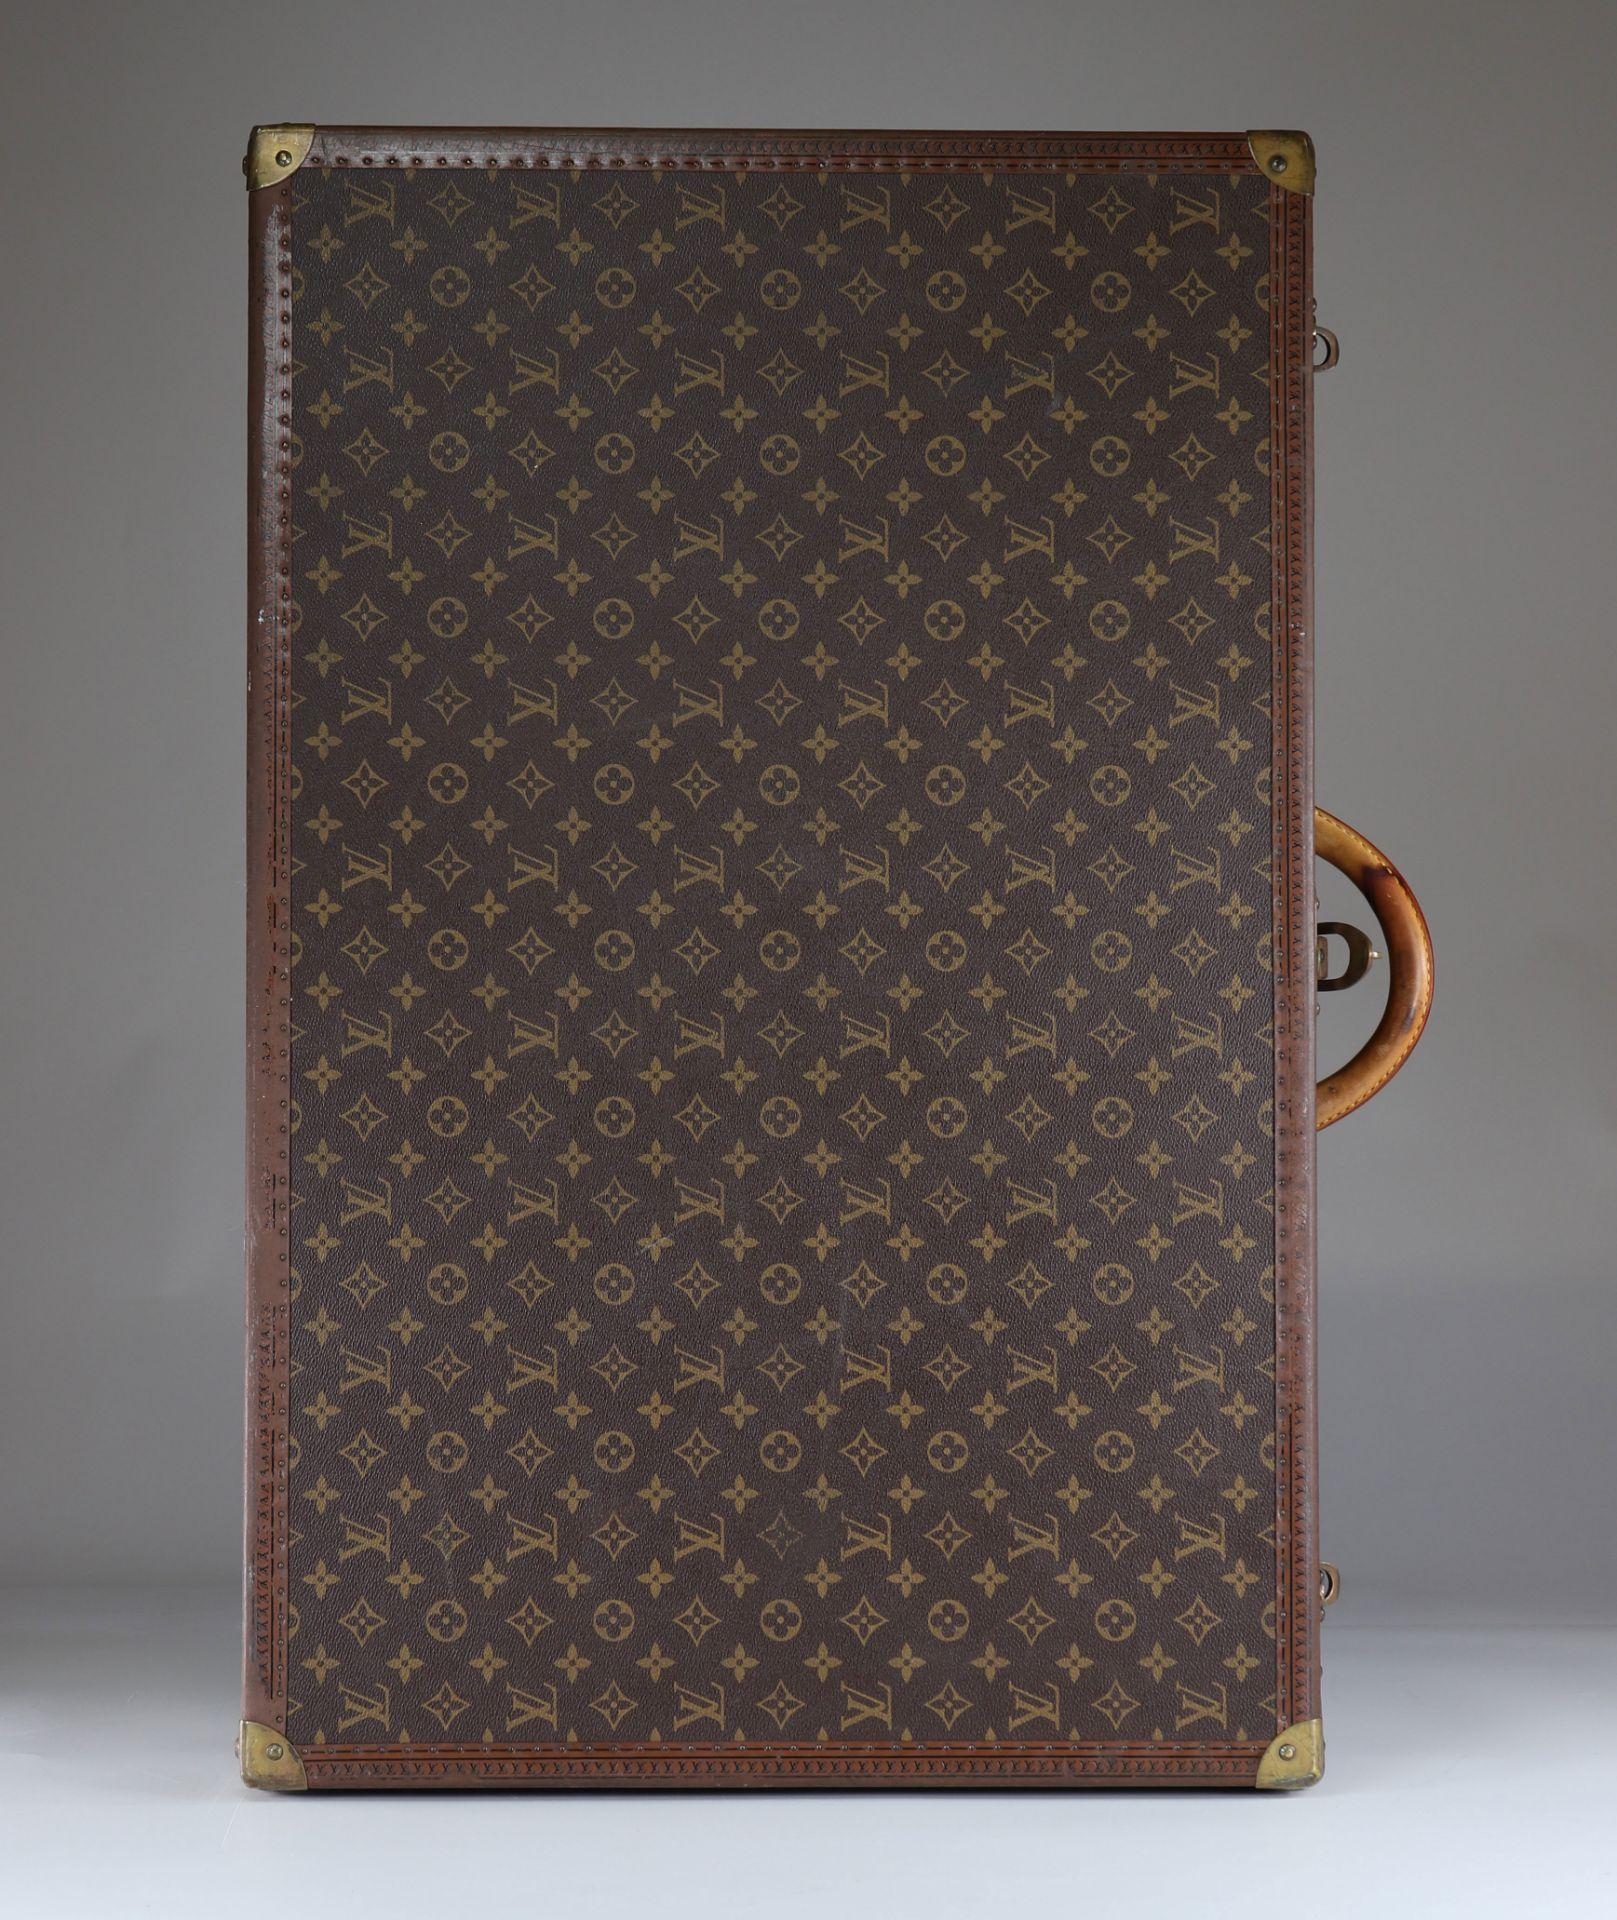 Louis Vuitton suitcase - Image 4 of 5